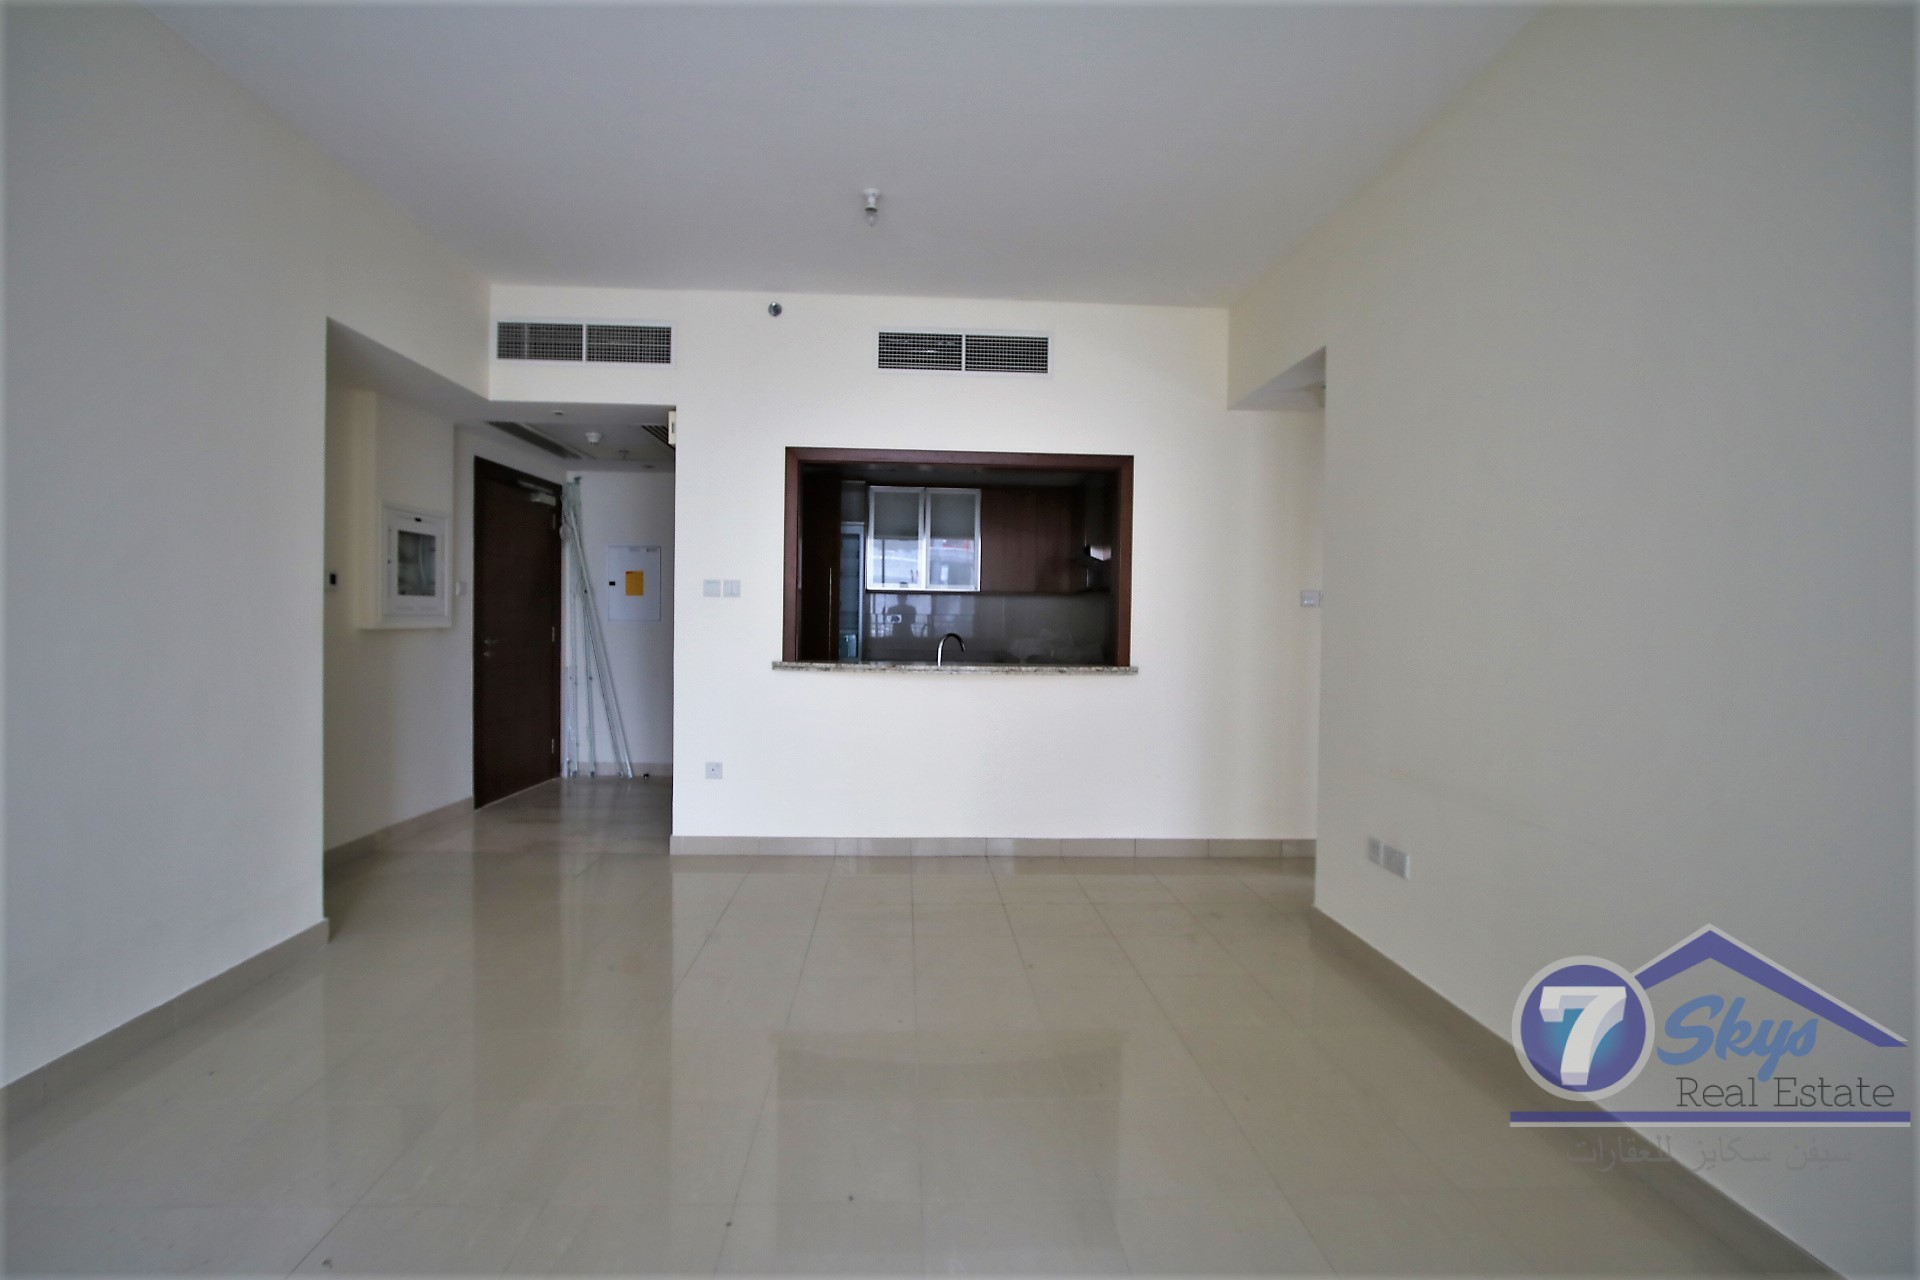 burj-khalifa-view-1-bed-room-available-i